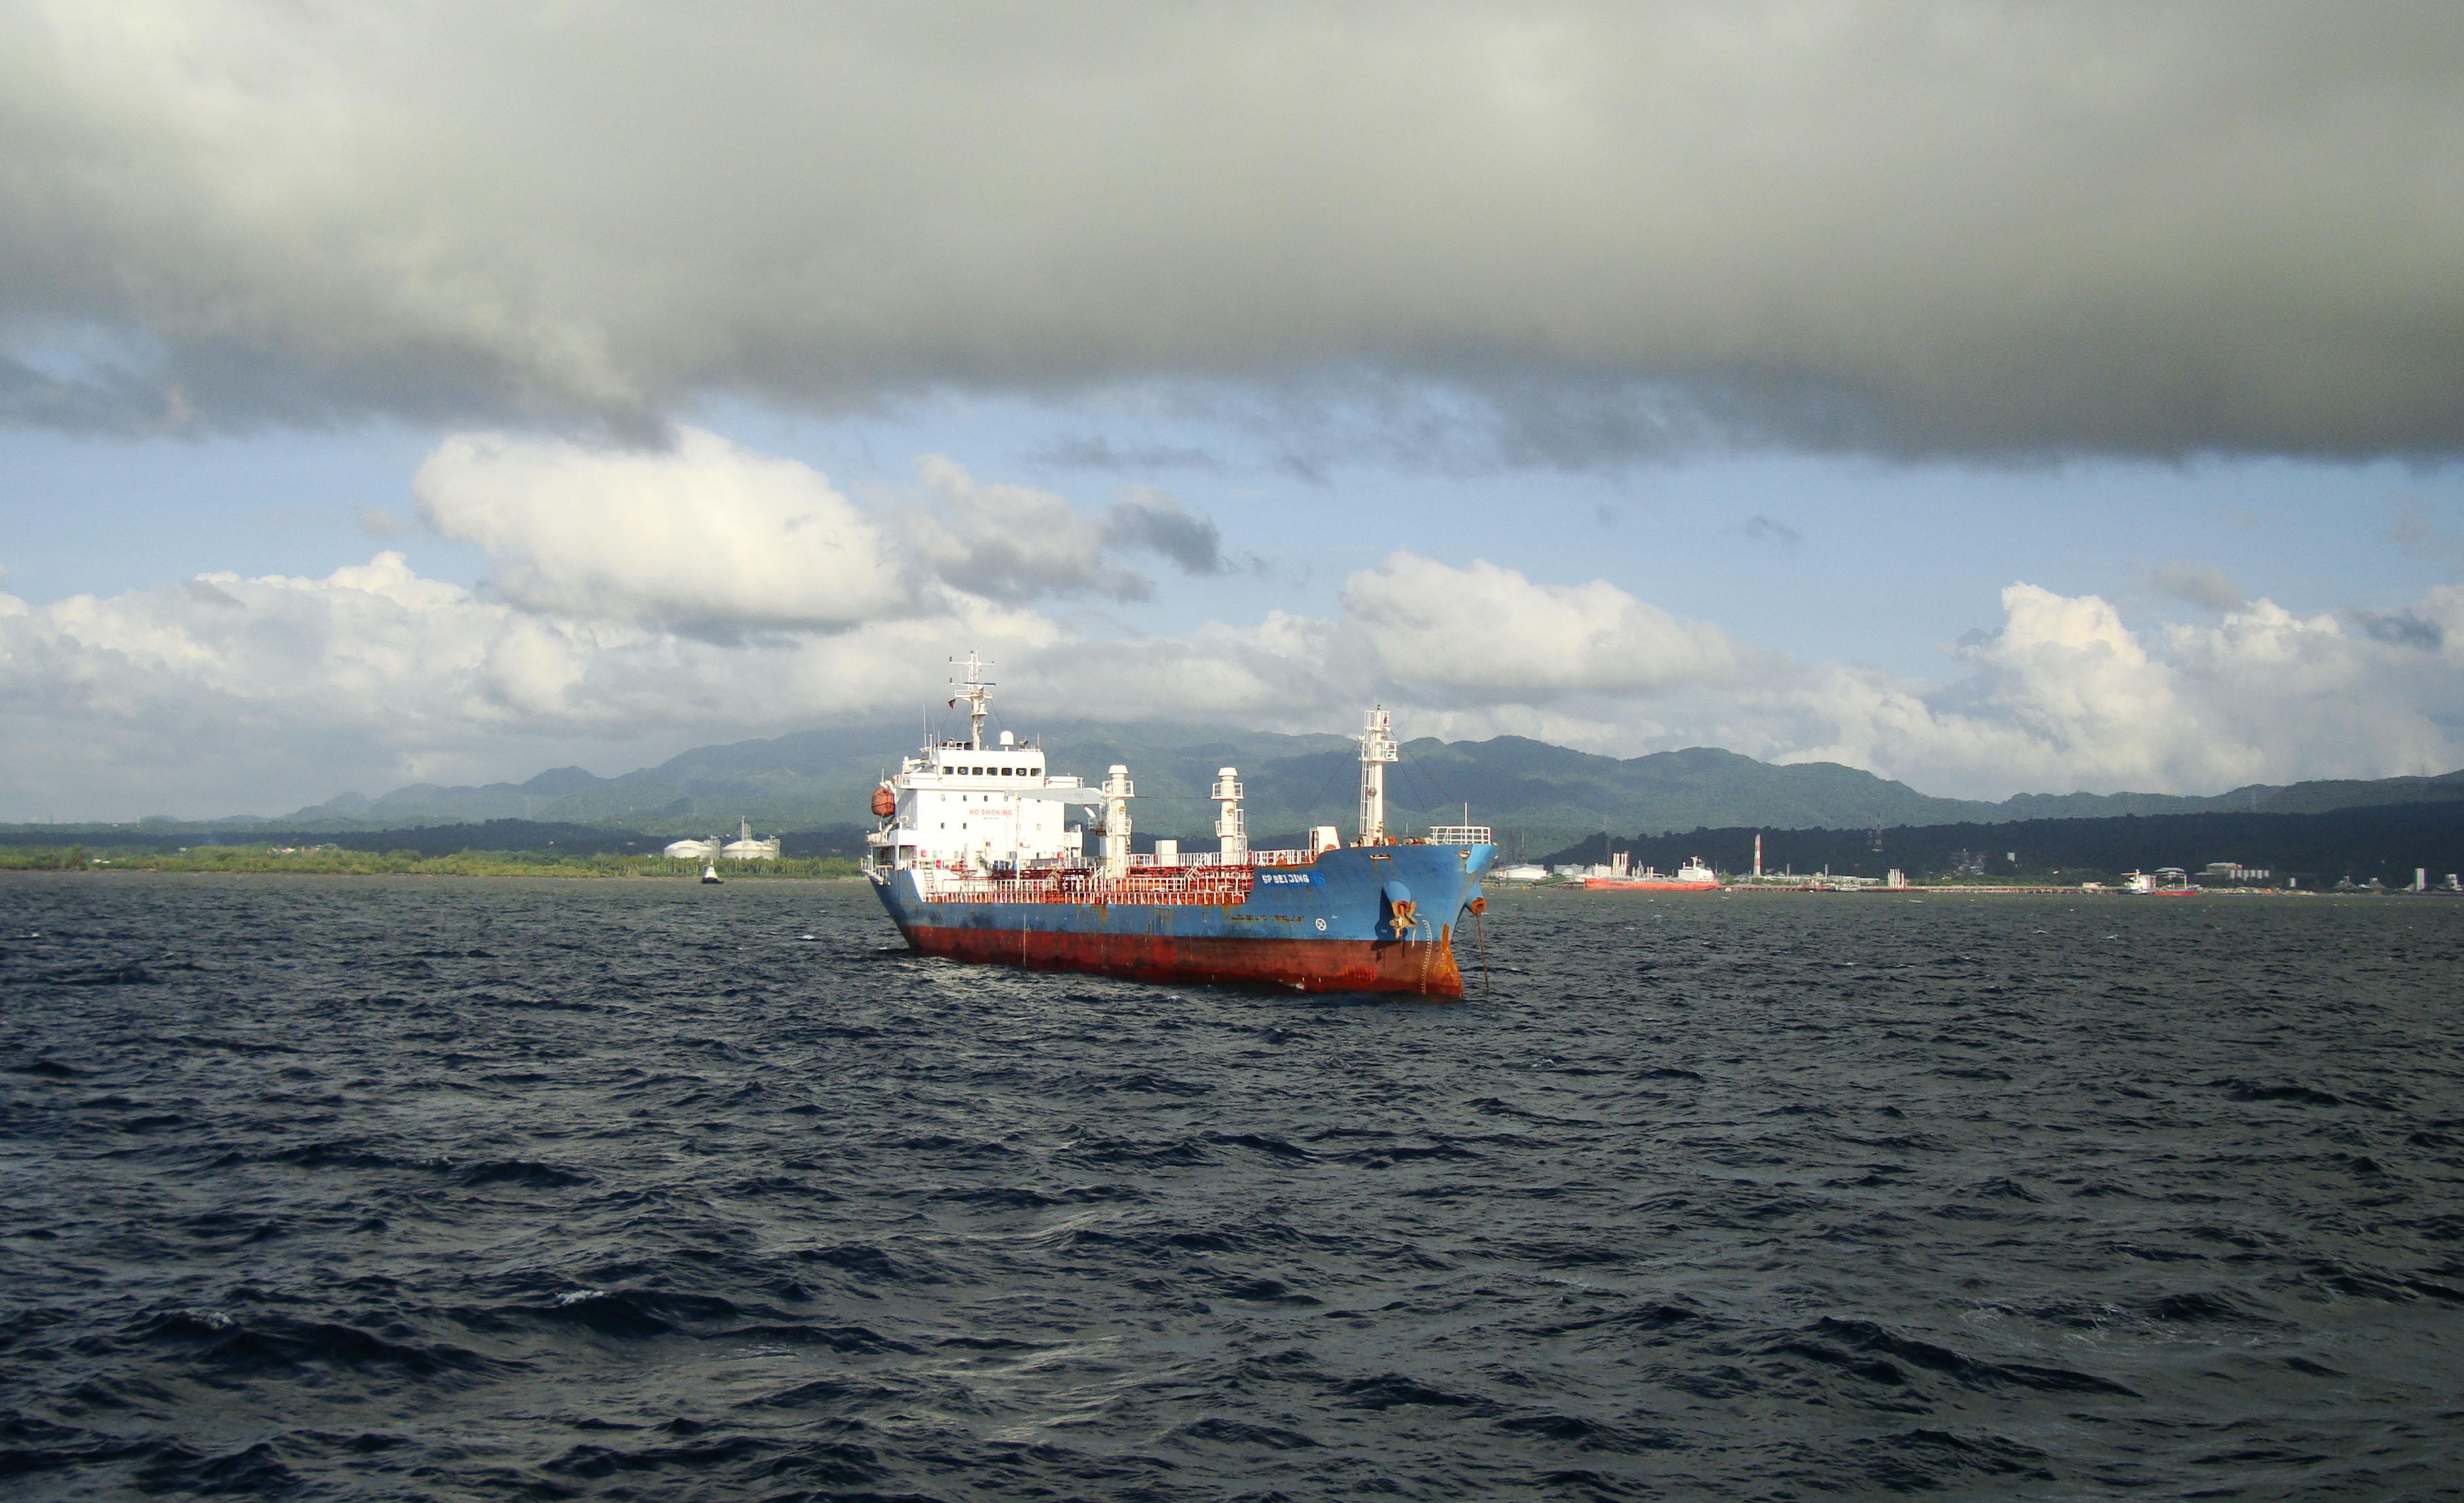 IMO 9471185 Tanker SP Beijing Majuro Batangus Bay Philppines 2010 08